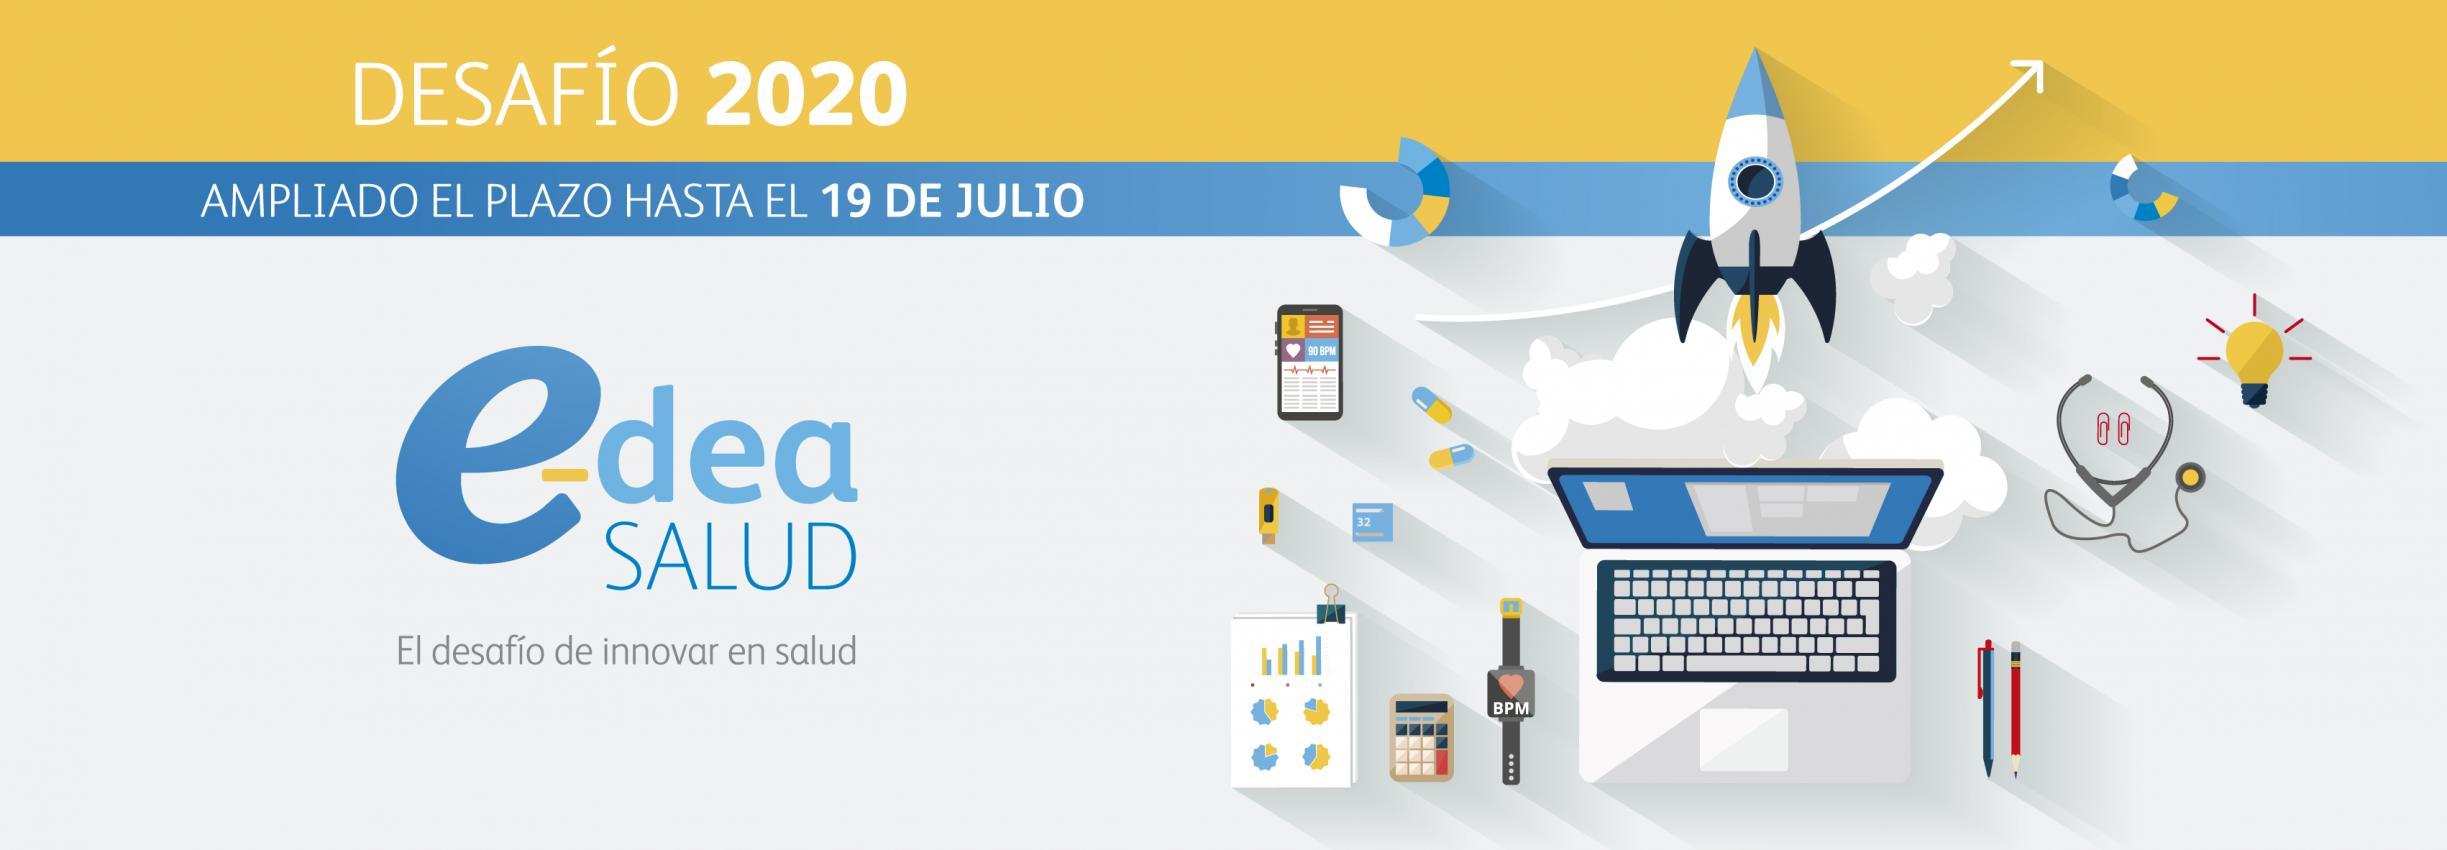 e-DeaSalud_2020